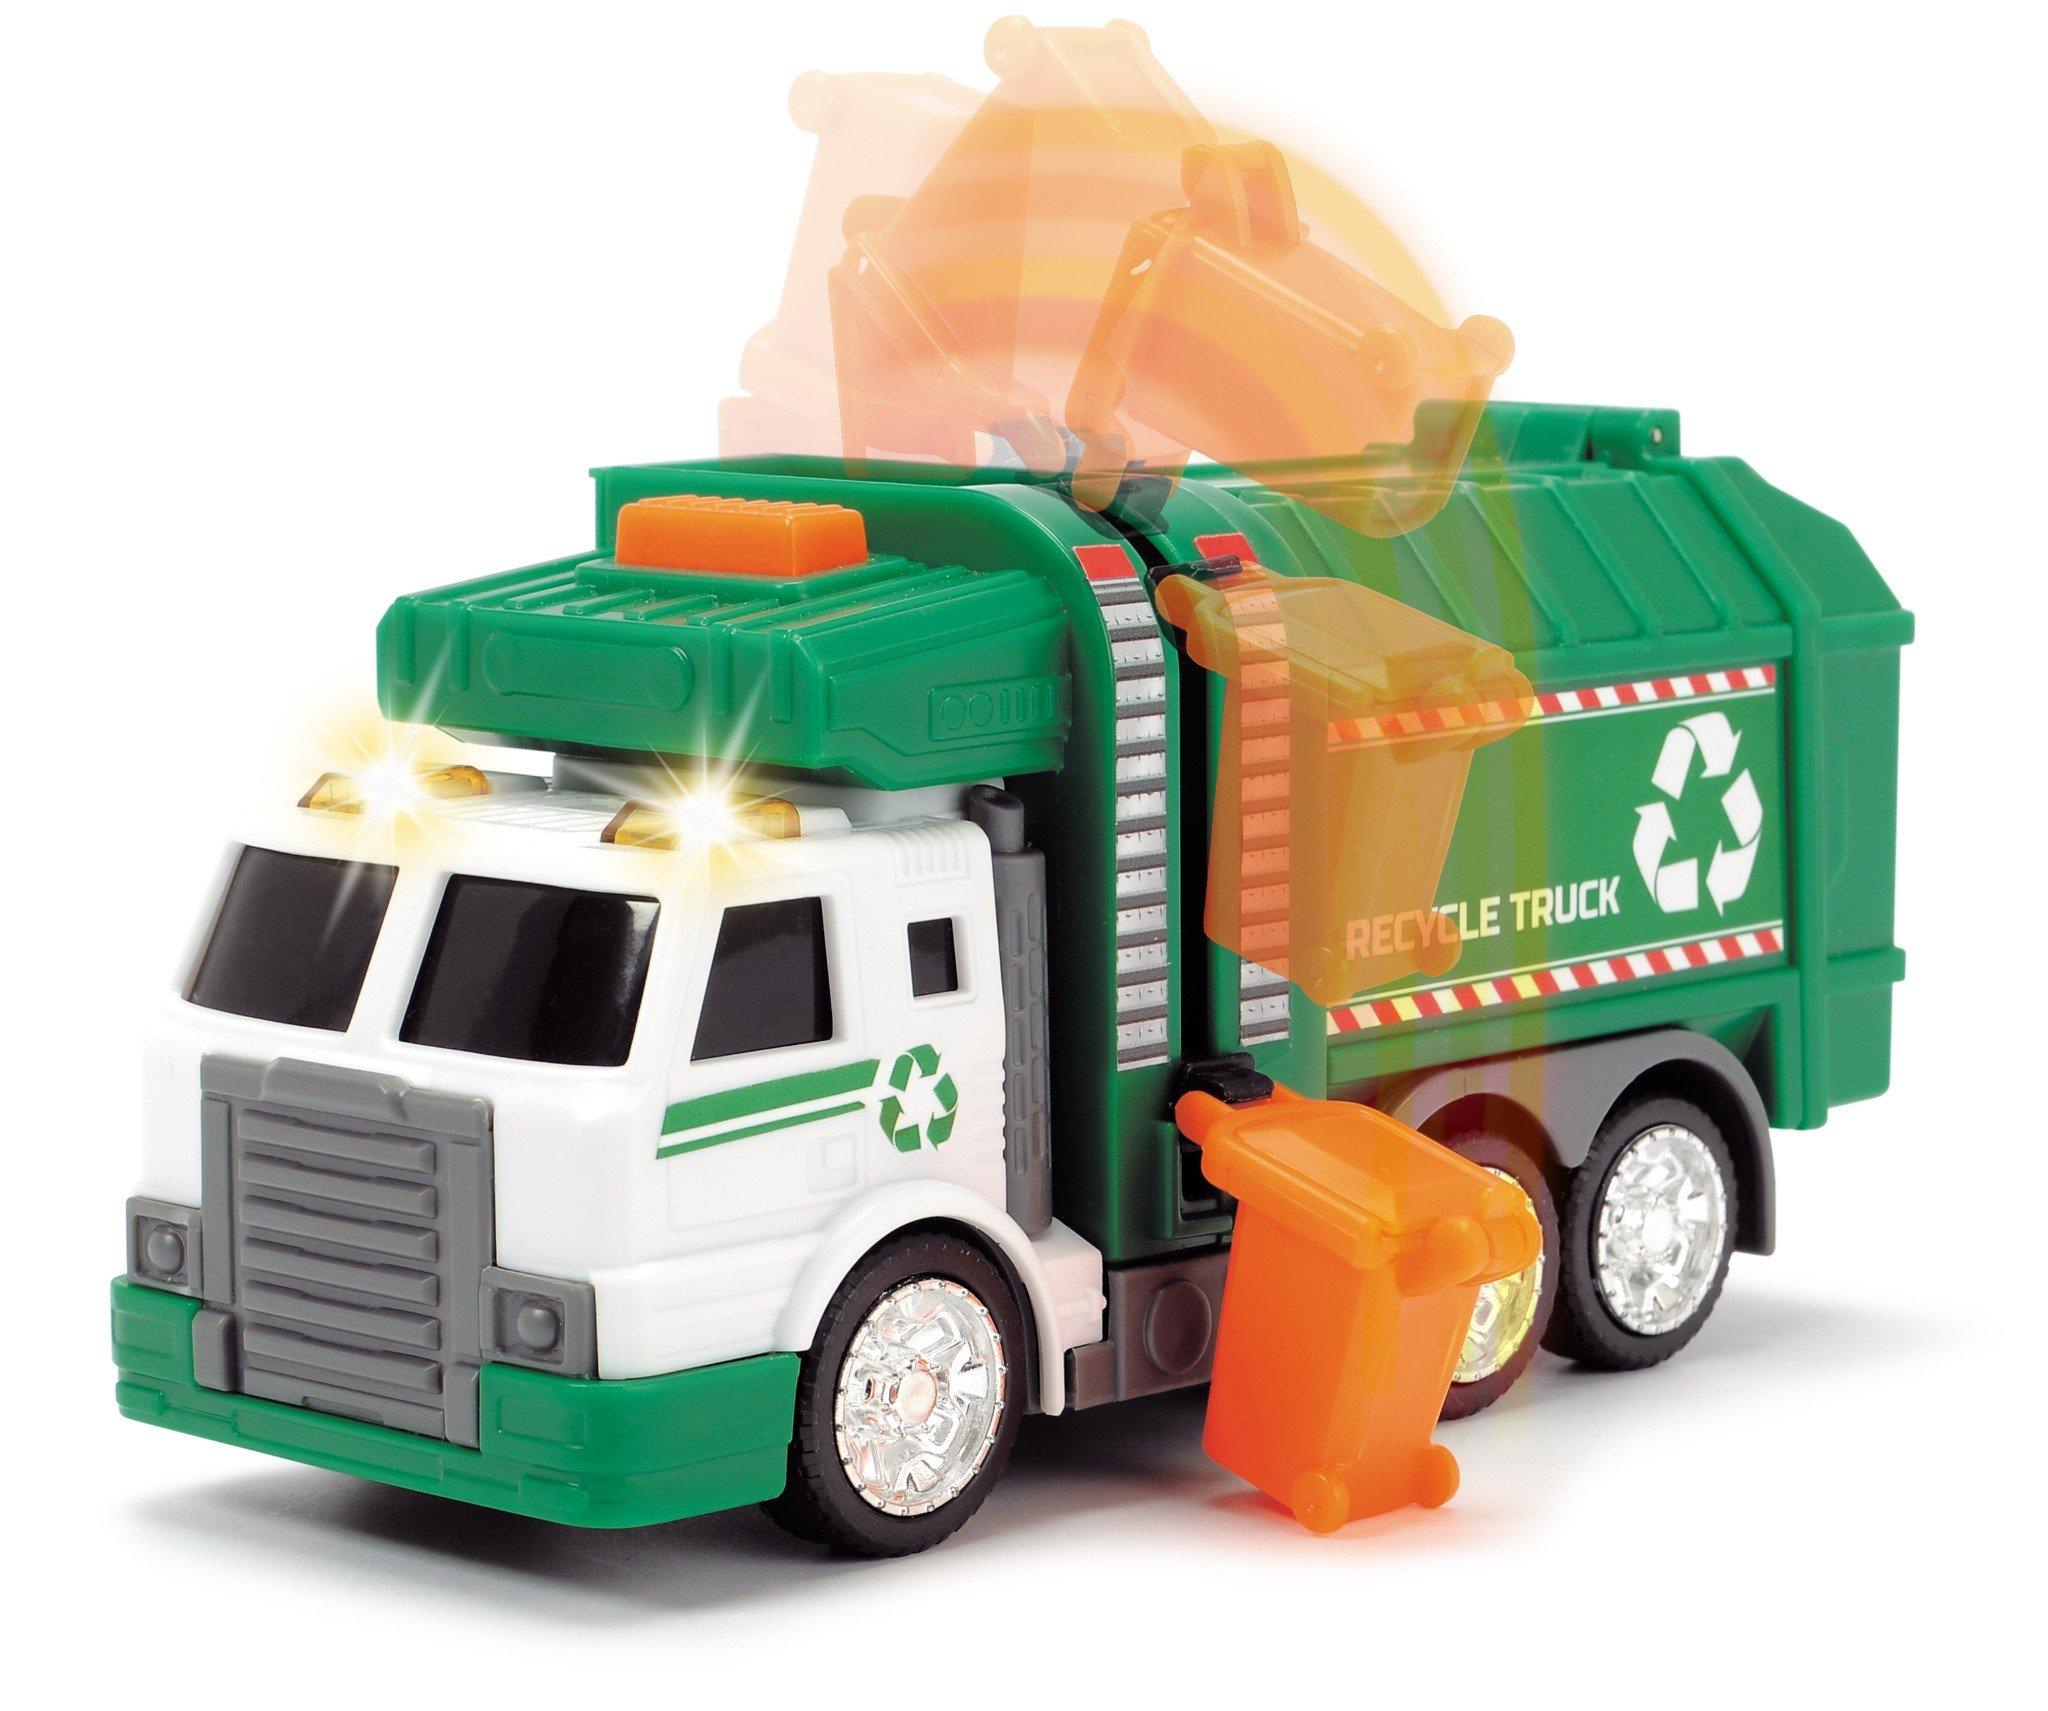 203302018 Recycling Truck|6pcs